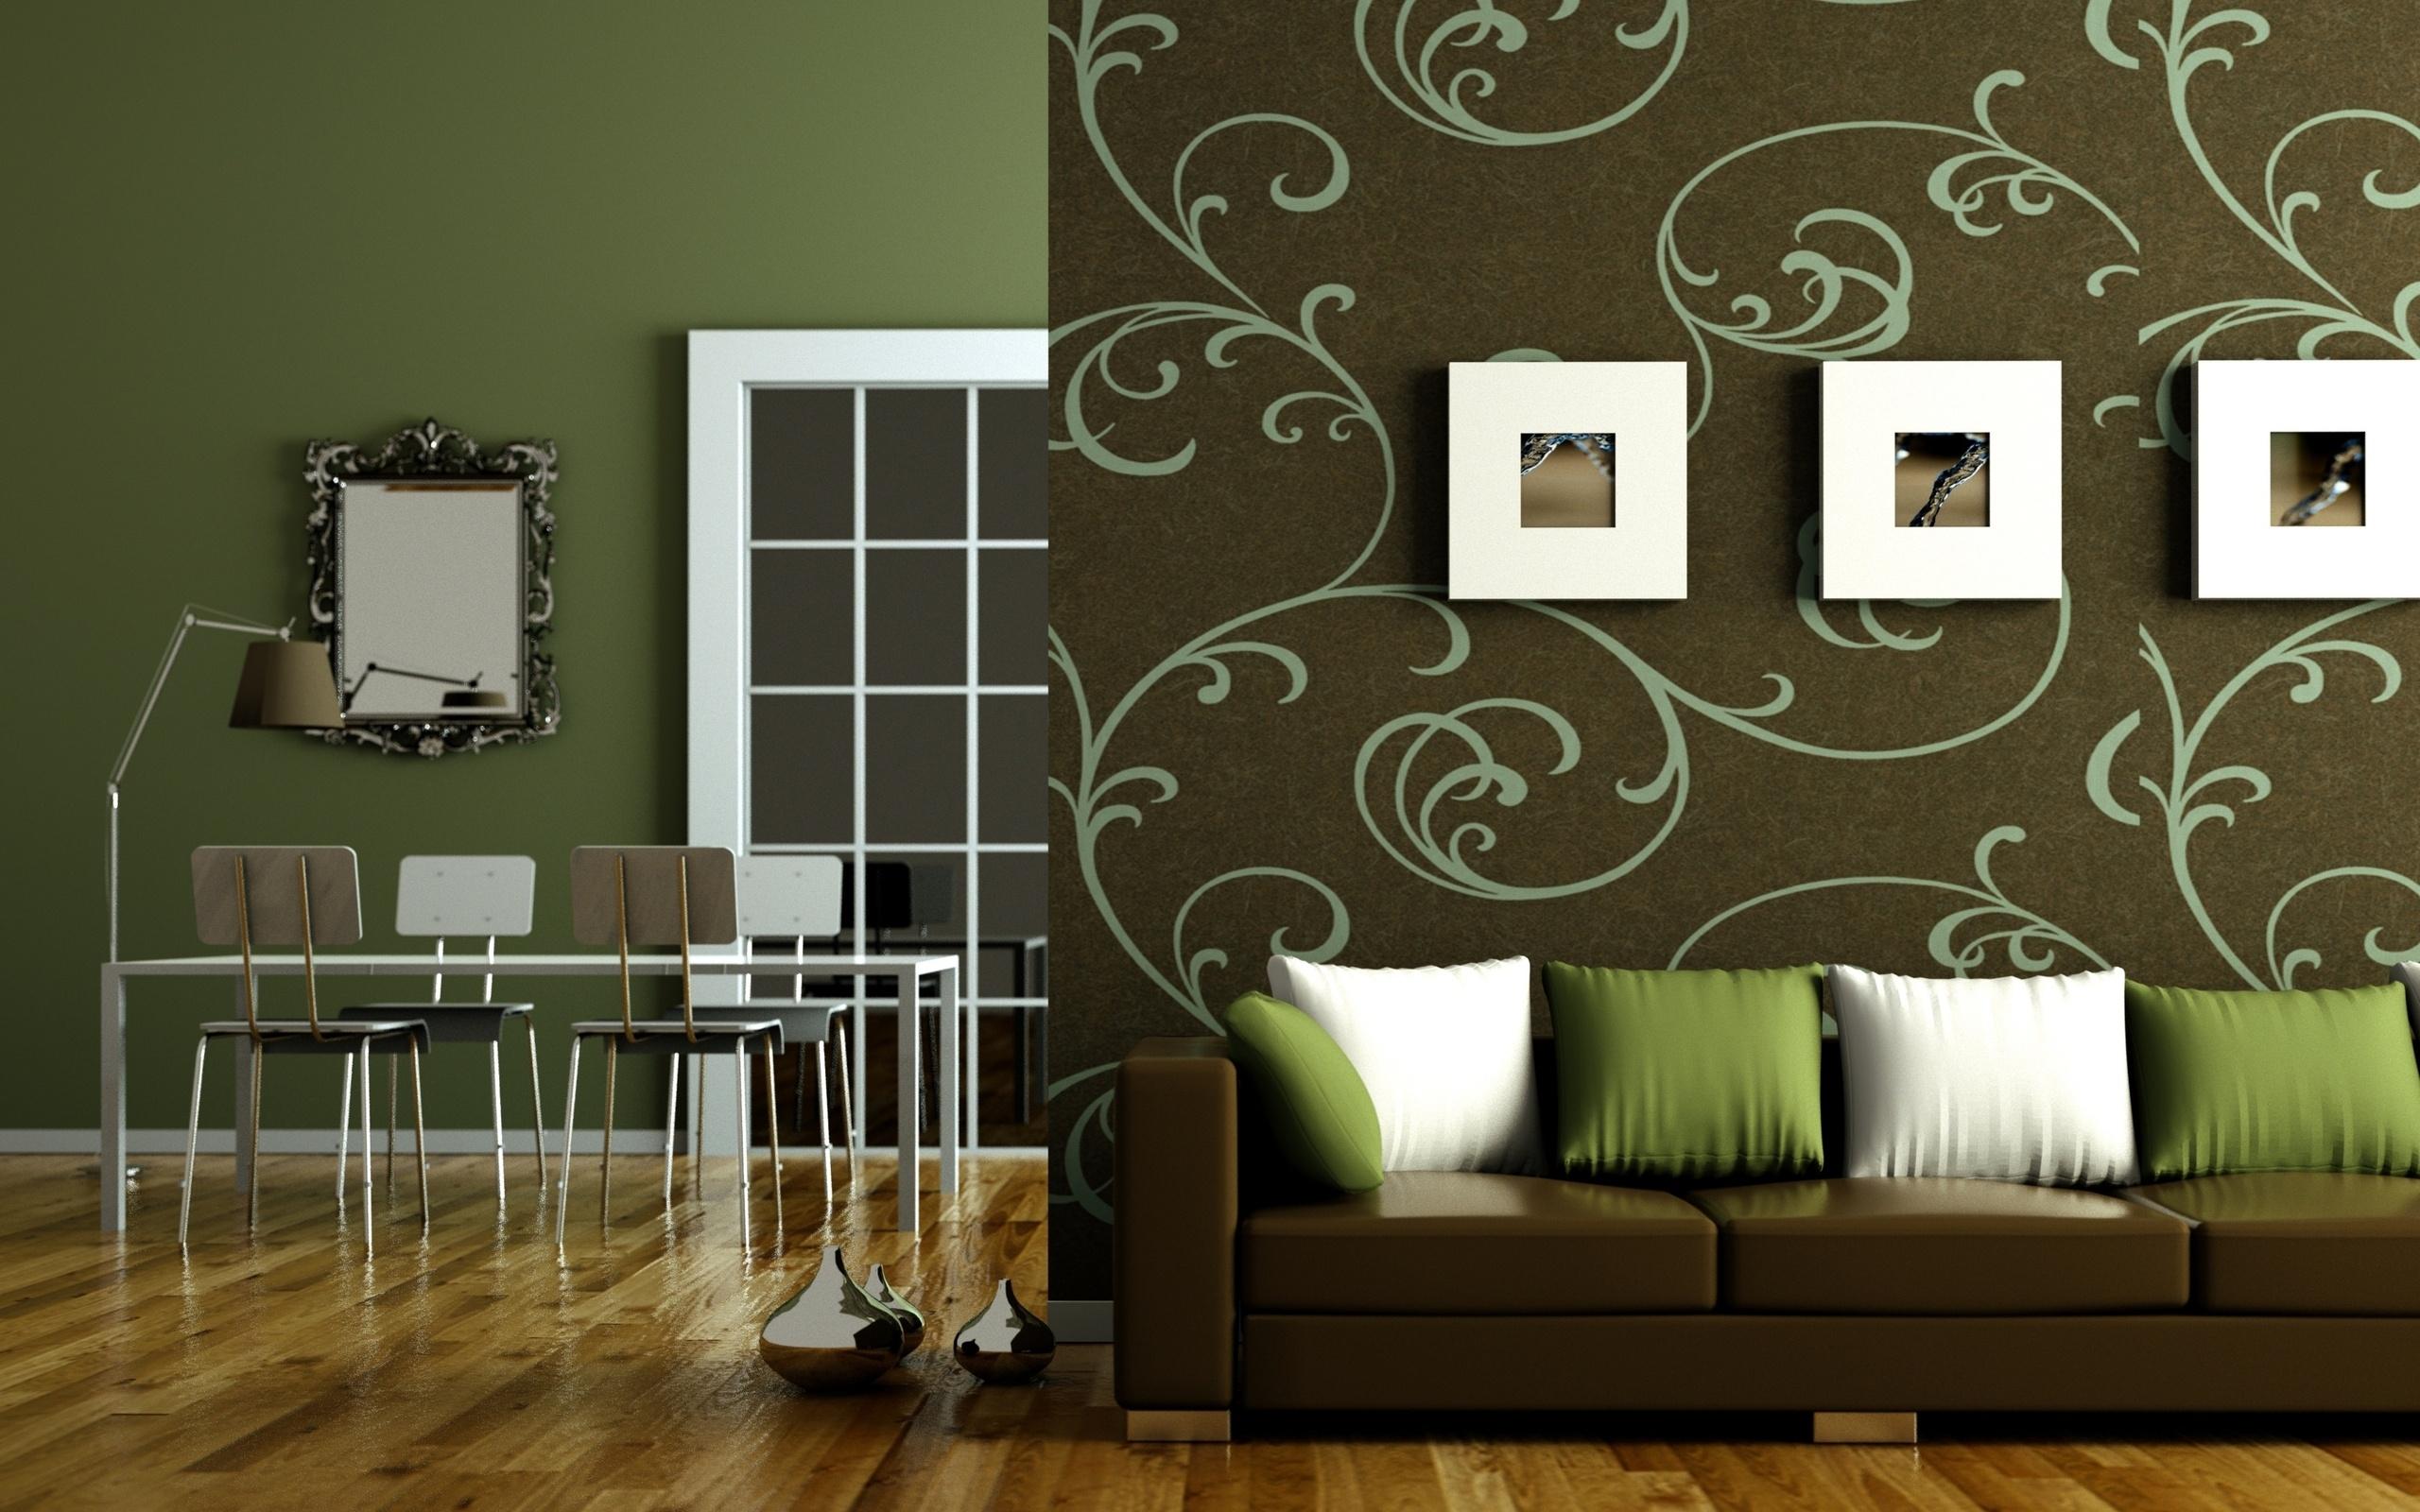 Flat Interior Design Wallpapers   2560x1600   1122607 2560x1600